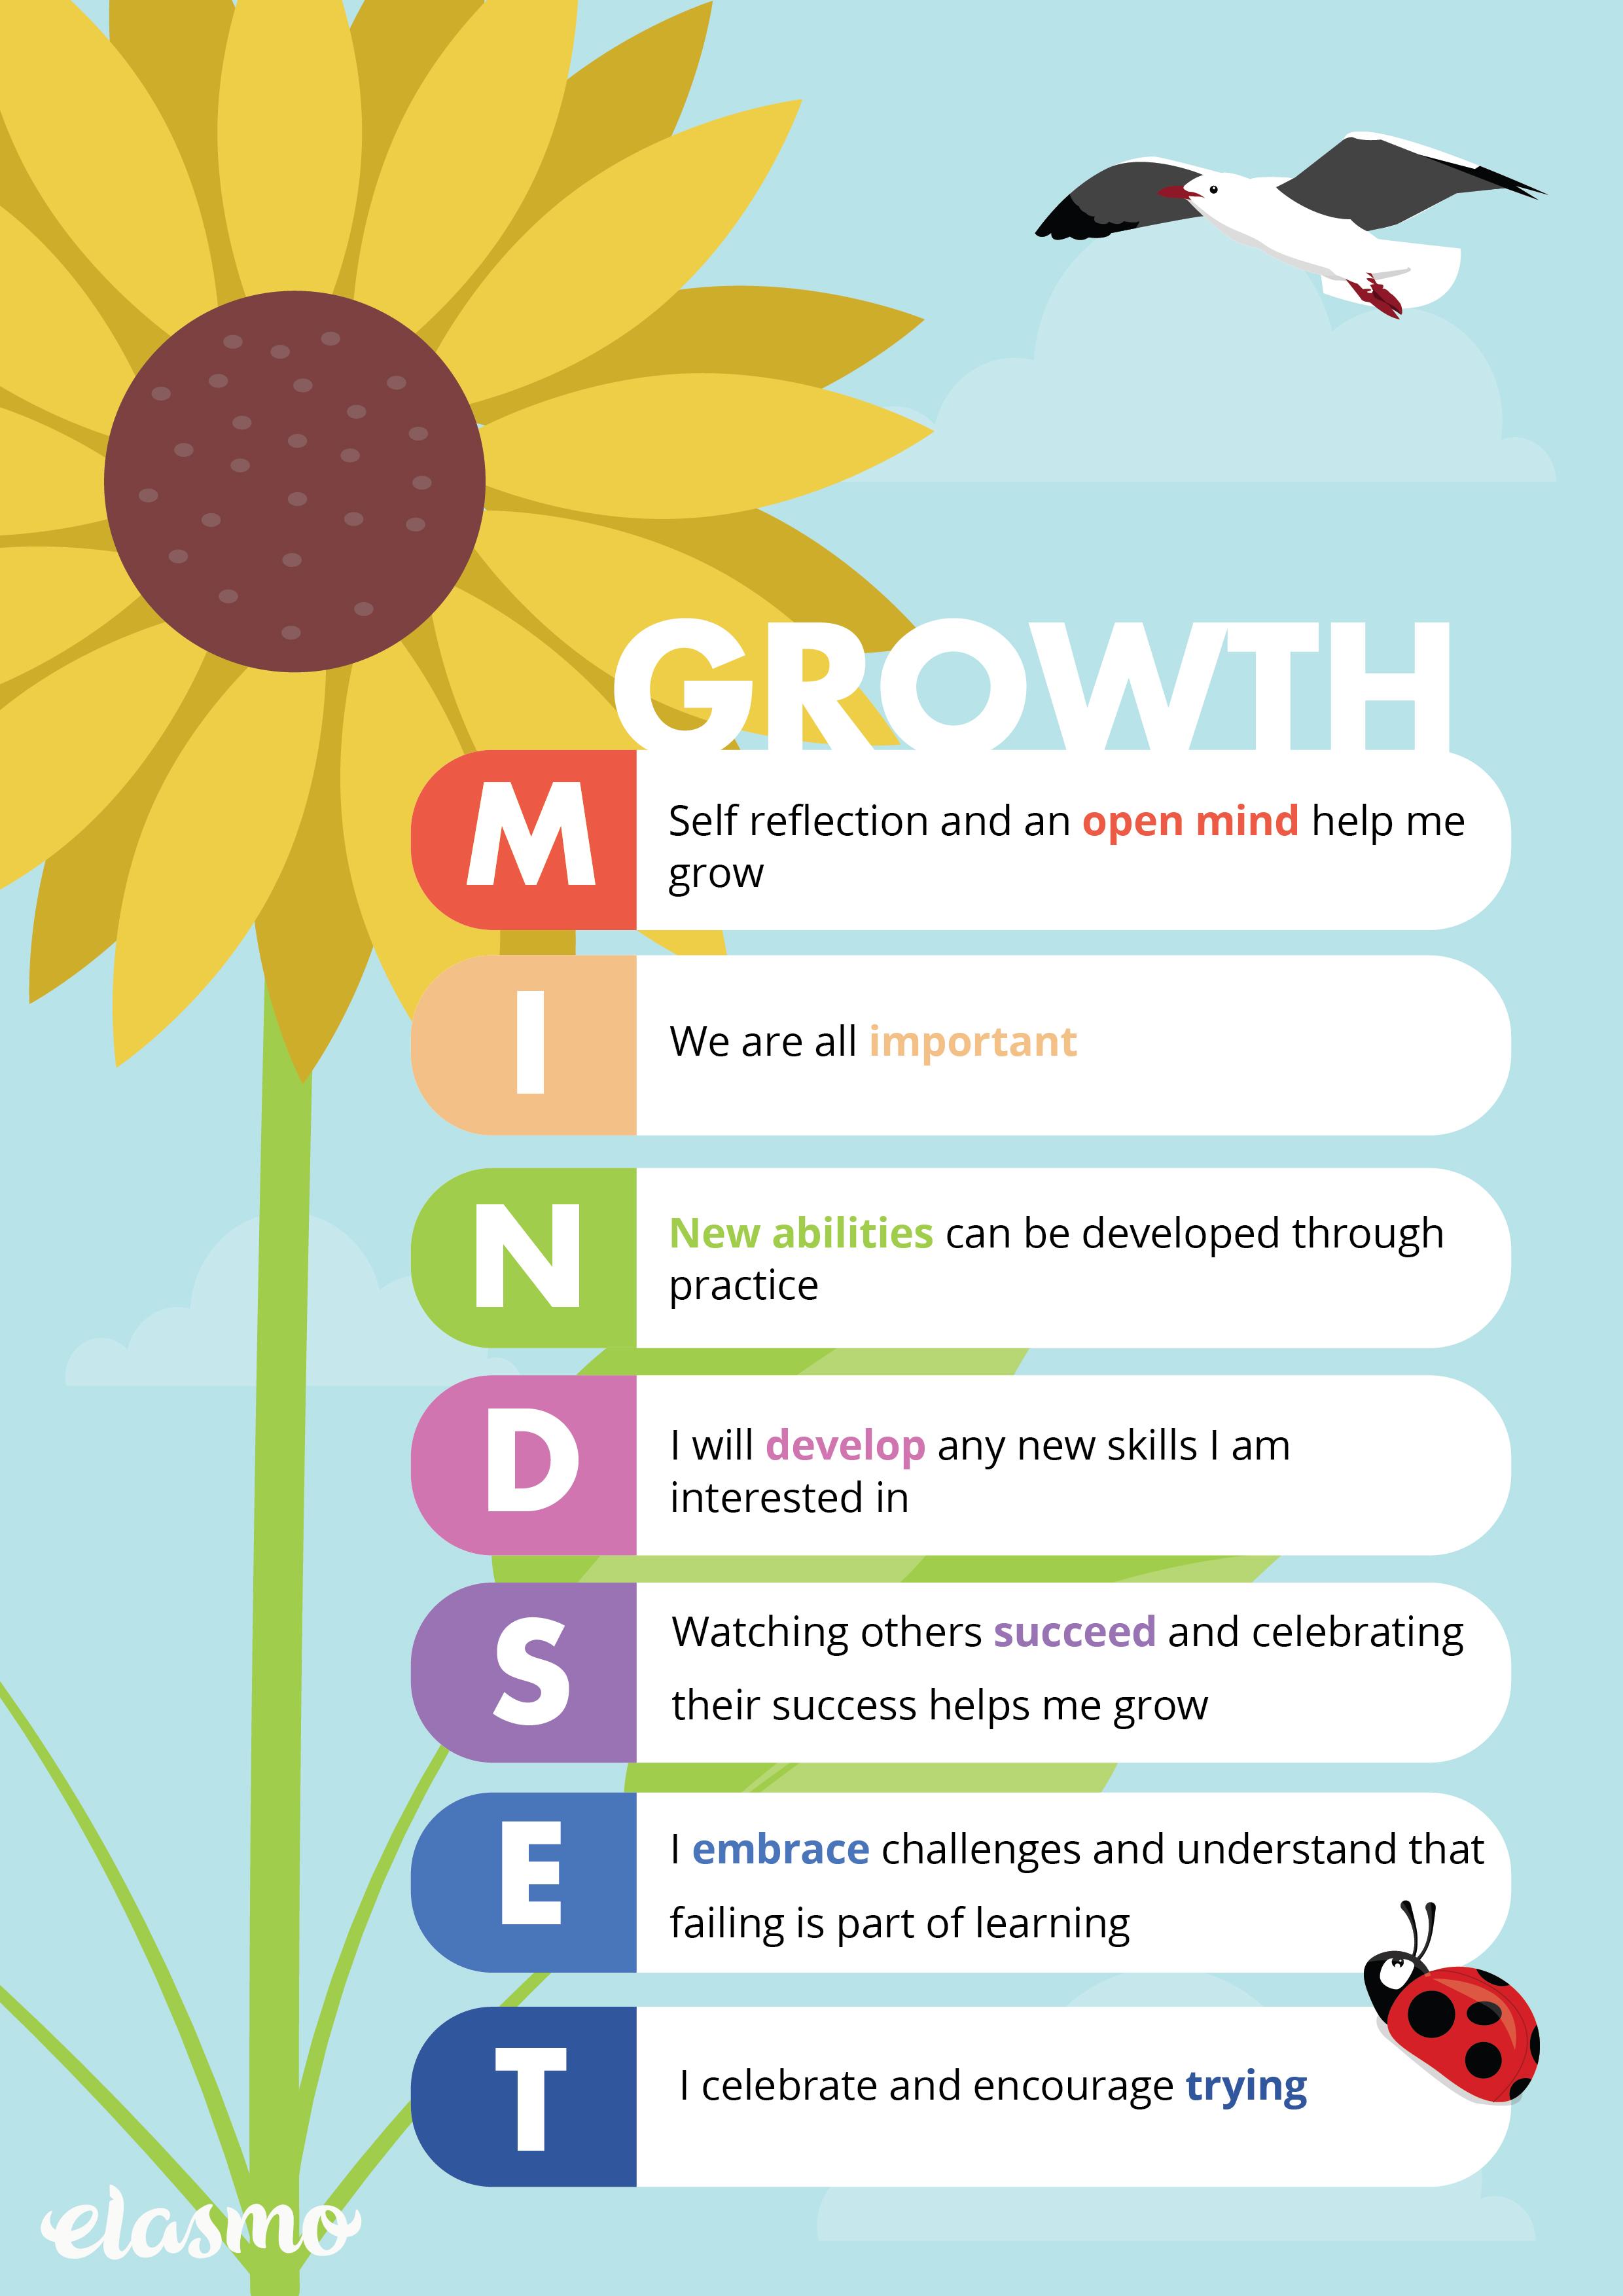 GrowthMindset_Growth mindset_Growth mindset.jpg